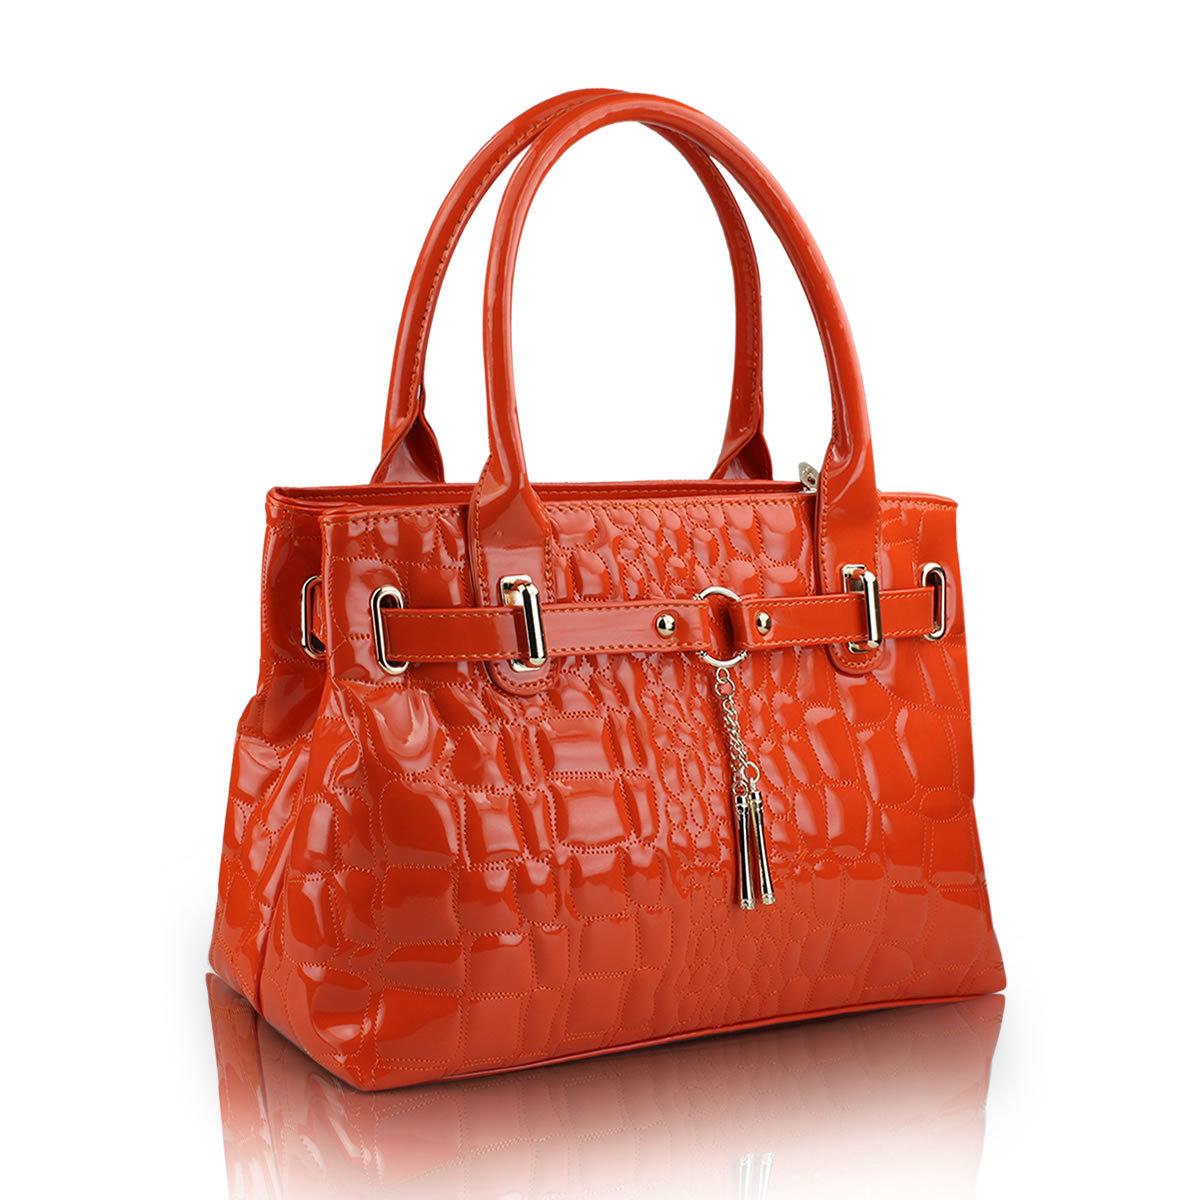 Цвет: Яркий оранжевый